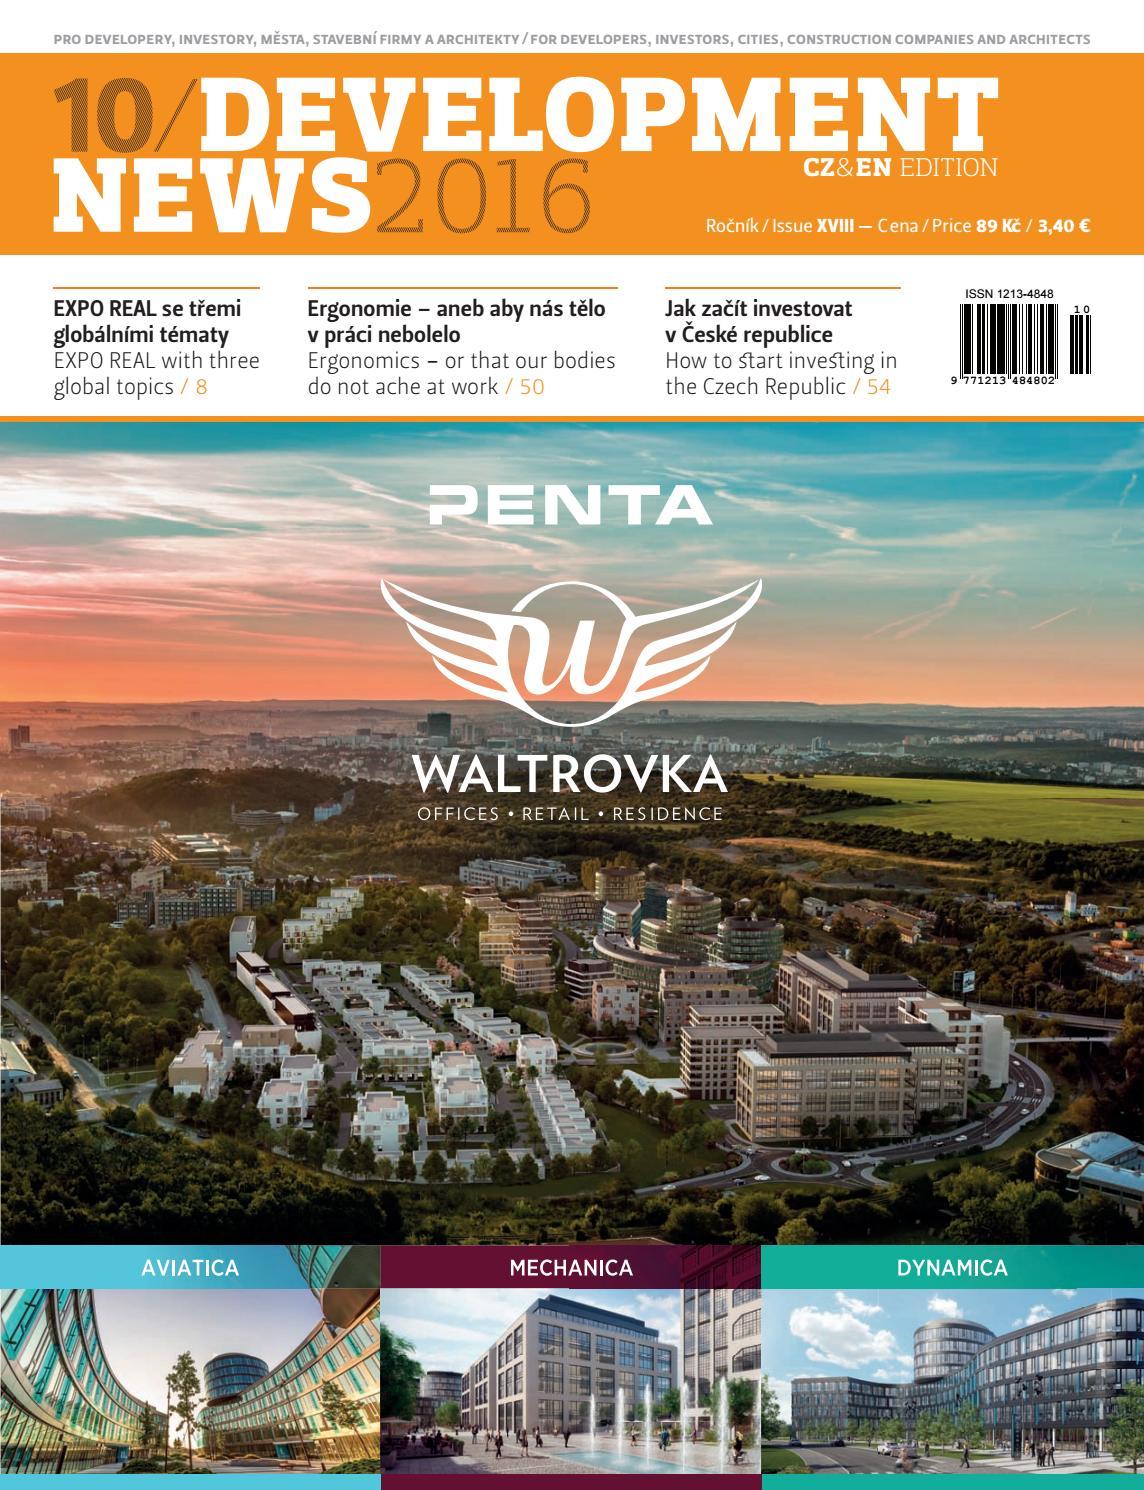 56c698a350fa Development News 10 2016 by Wpremium event - issuu